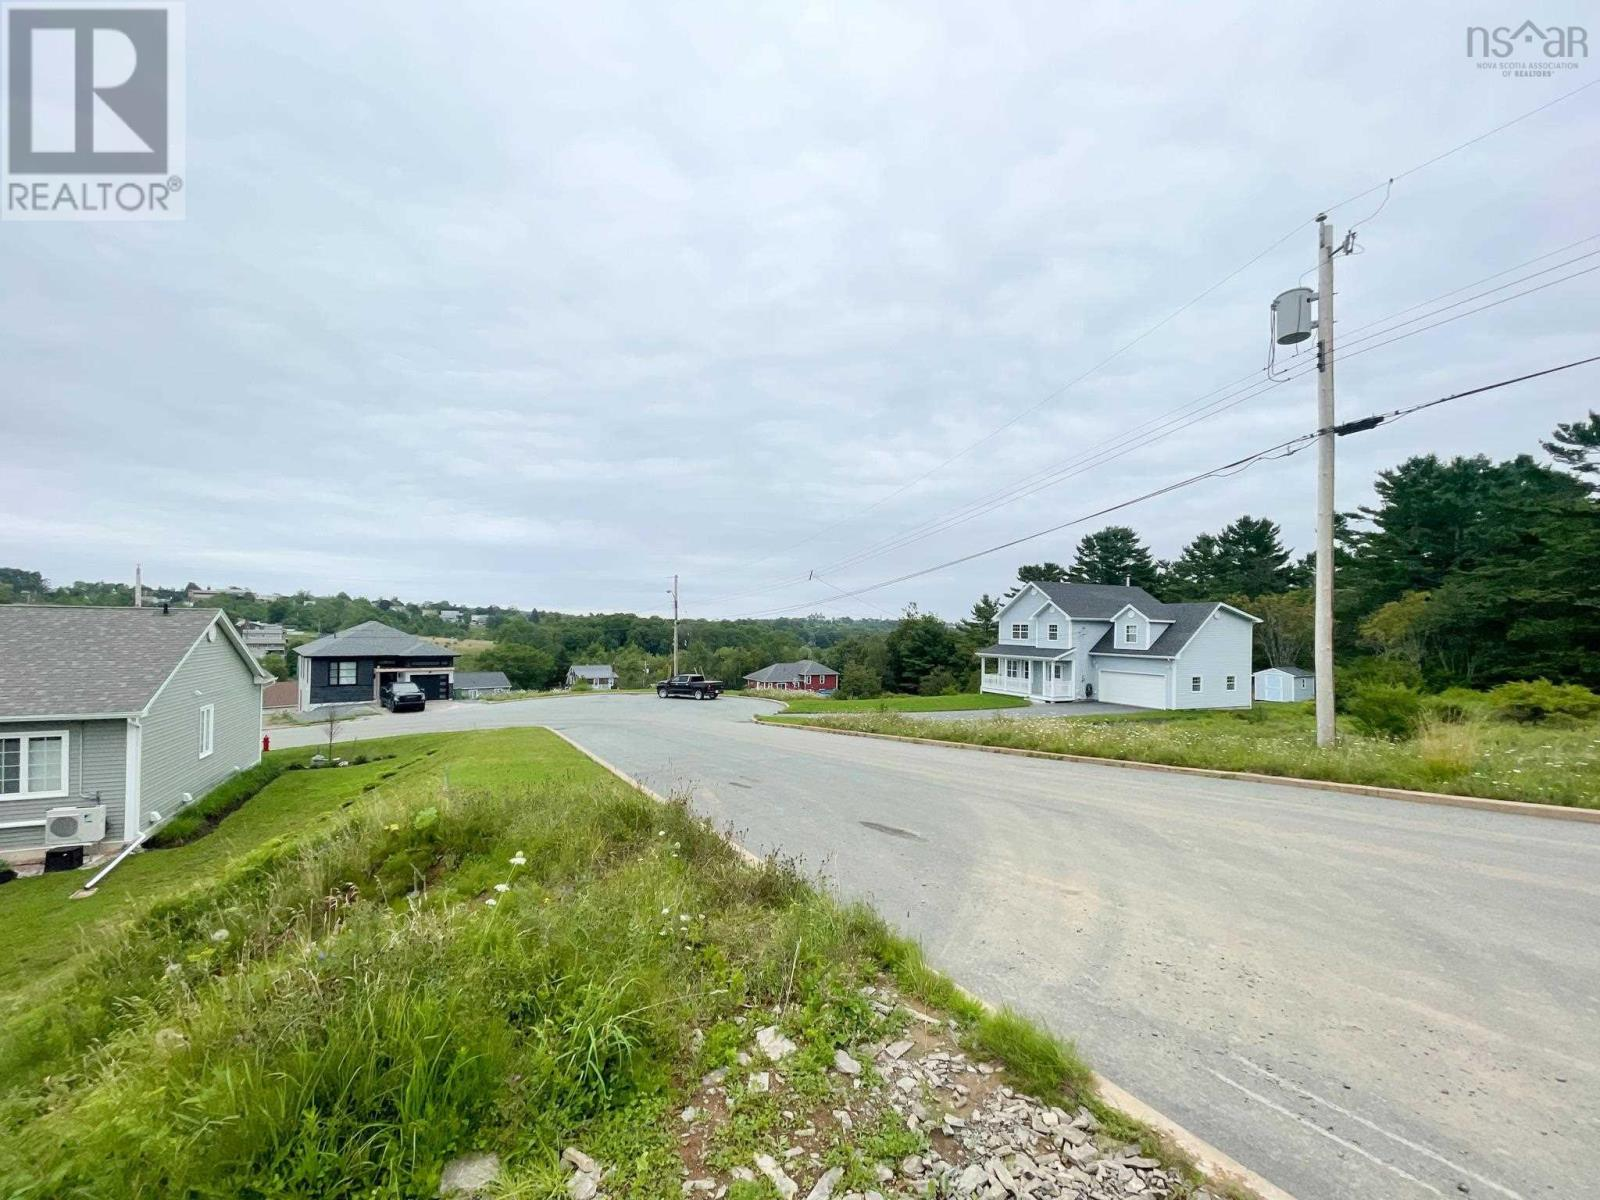 Lot 29 Hebb Street, Lunenburg, Nova Scotia  B0J 2C0 - Photo 12 - 202120490